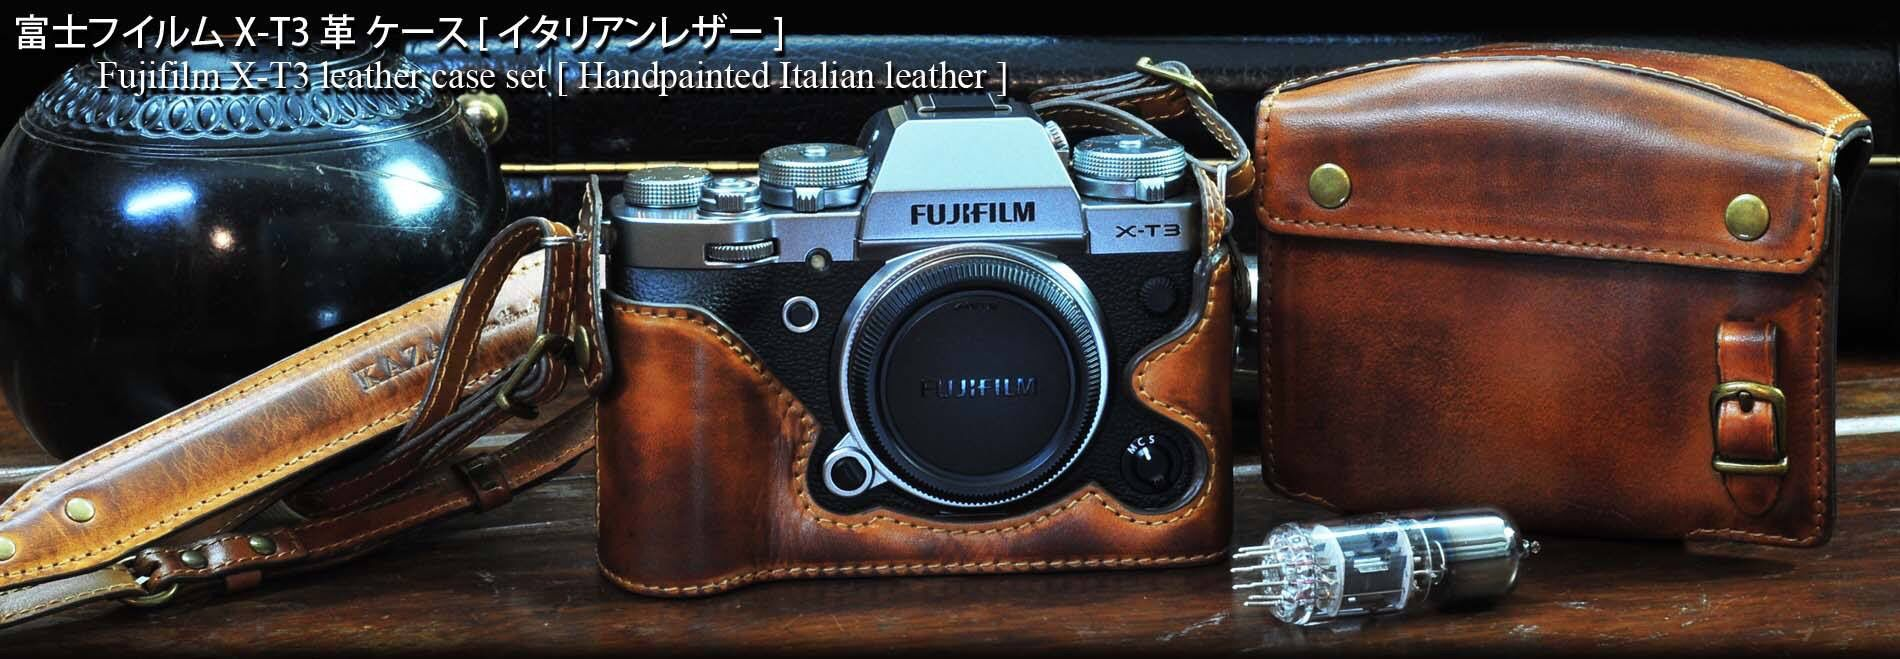 Fujifilm XT3 leather case #kazadeluxe #fujifilmxt3 #xt3